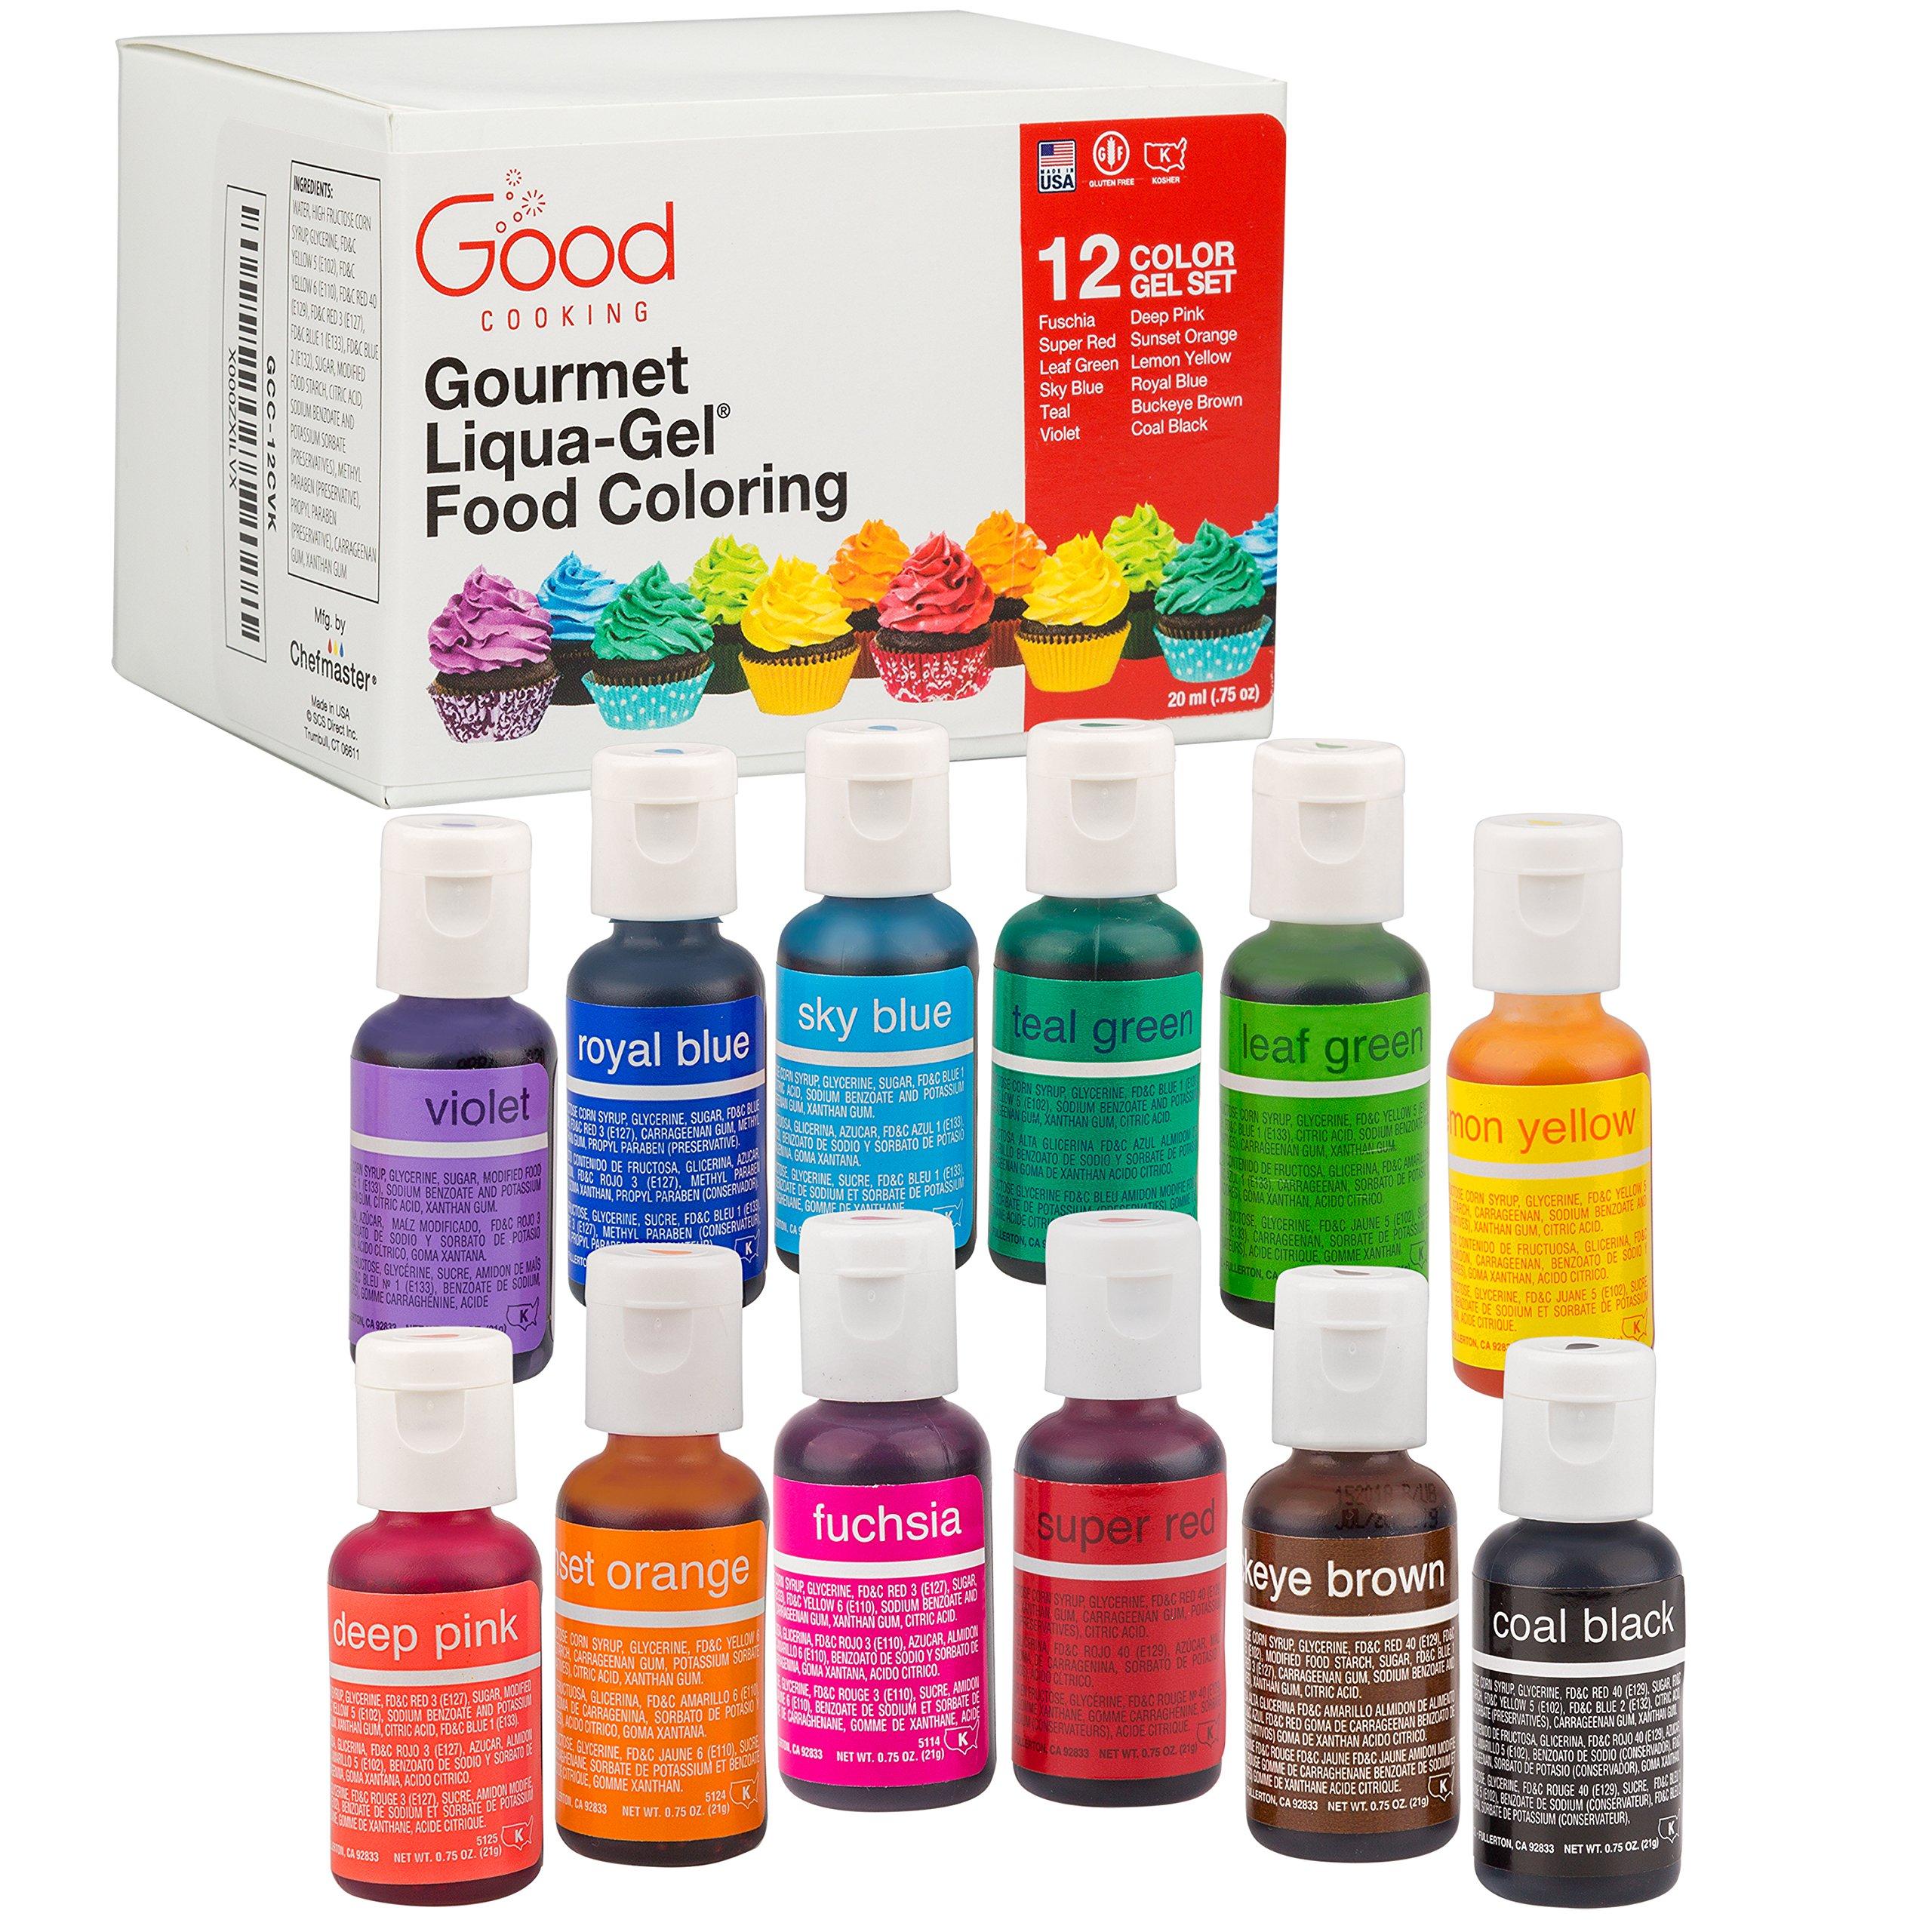 Food Coloring Liqua-Gel - 12 Color Variety Kit in .75 fl. oz. (20ml) Bottles by Good Cooking